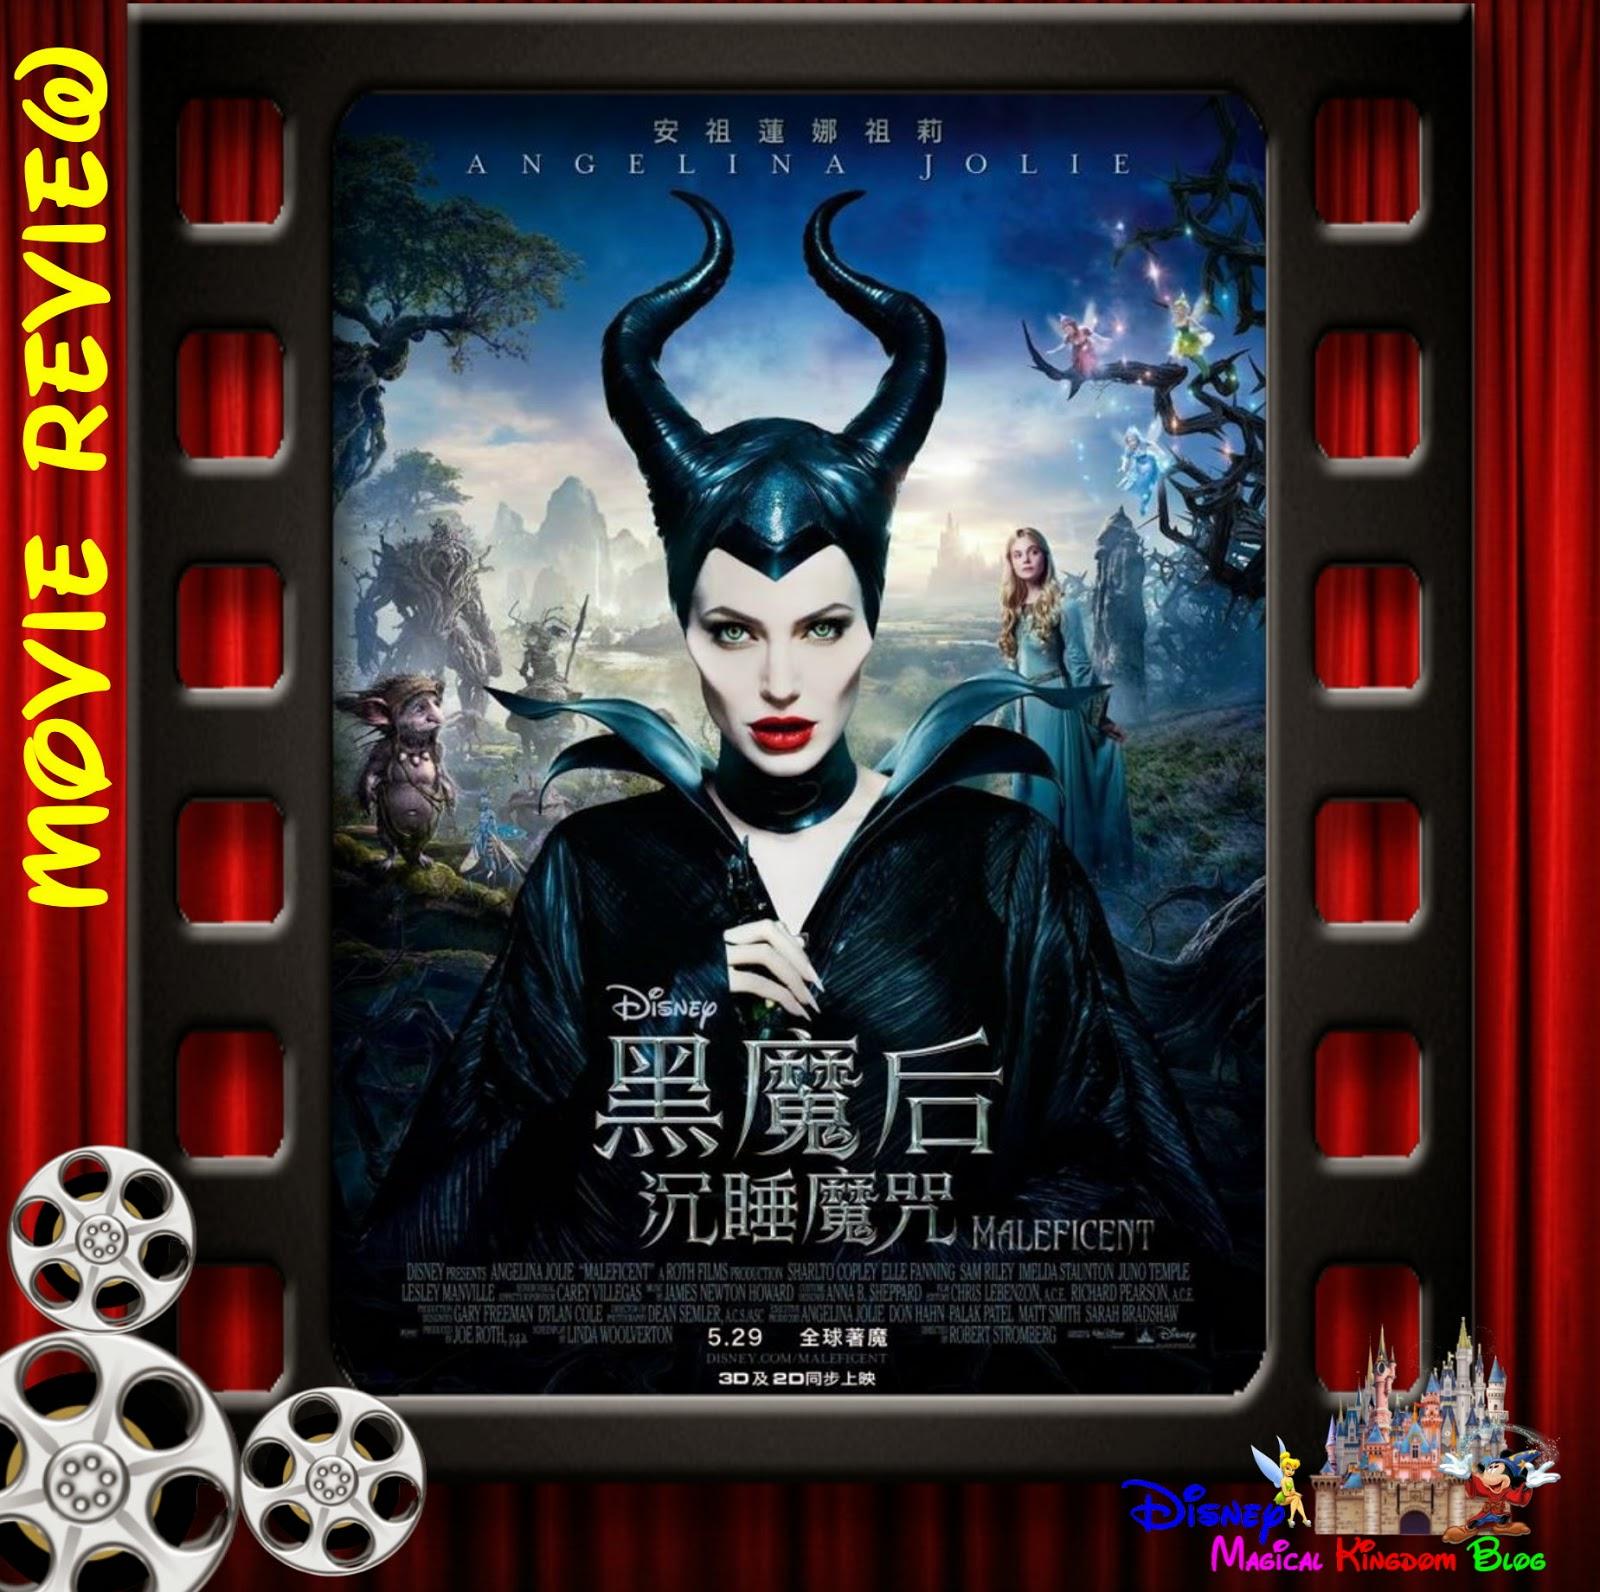 Disney Magical Kingdom Blog: 電影觀後分享:《黑魔后:沉睡魔咒》